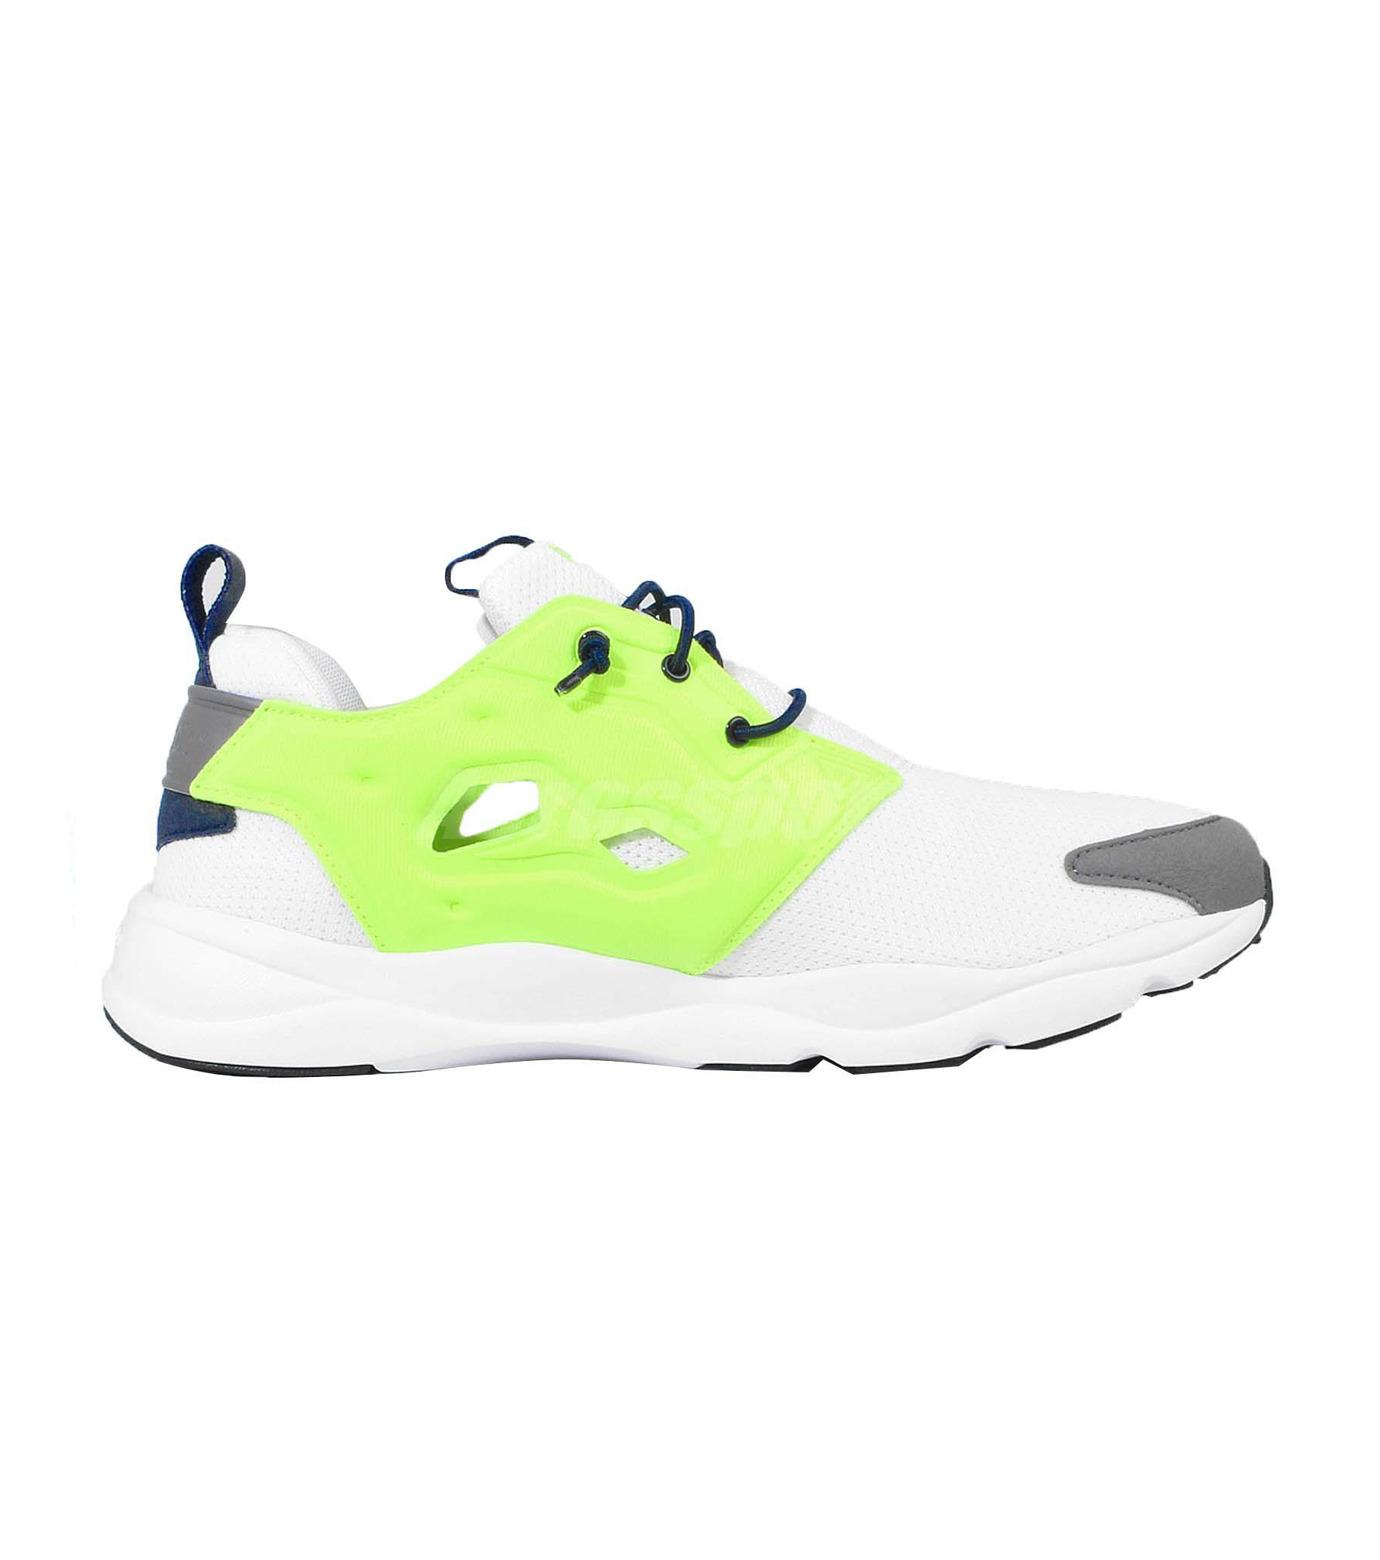 Reebok(リーボック)のFURYLITE-YELLOW(シューズ/shoes)-V69441-32 拡大詳細画像1